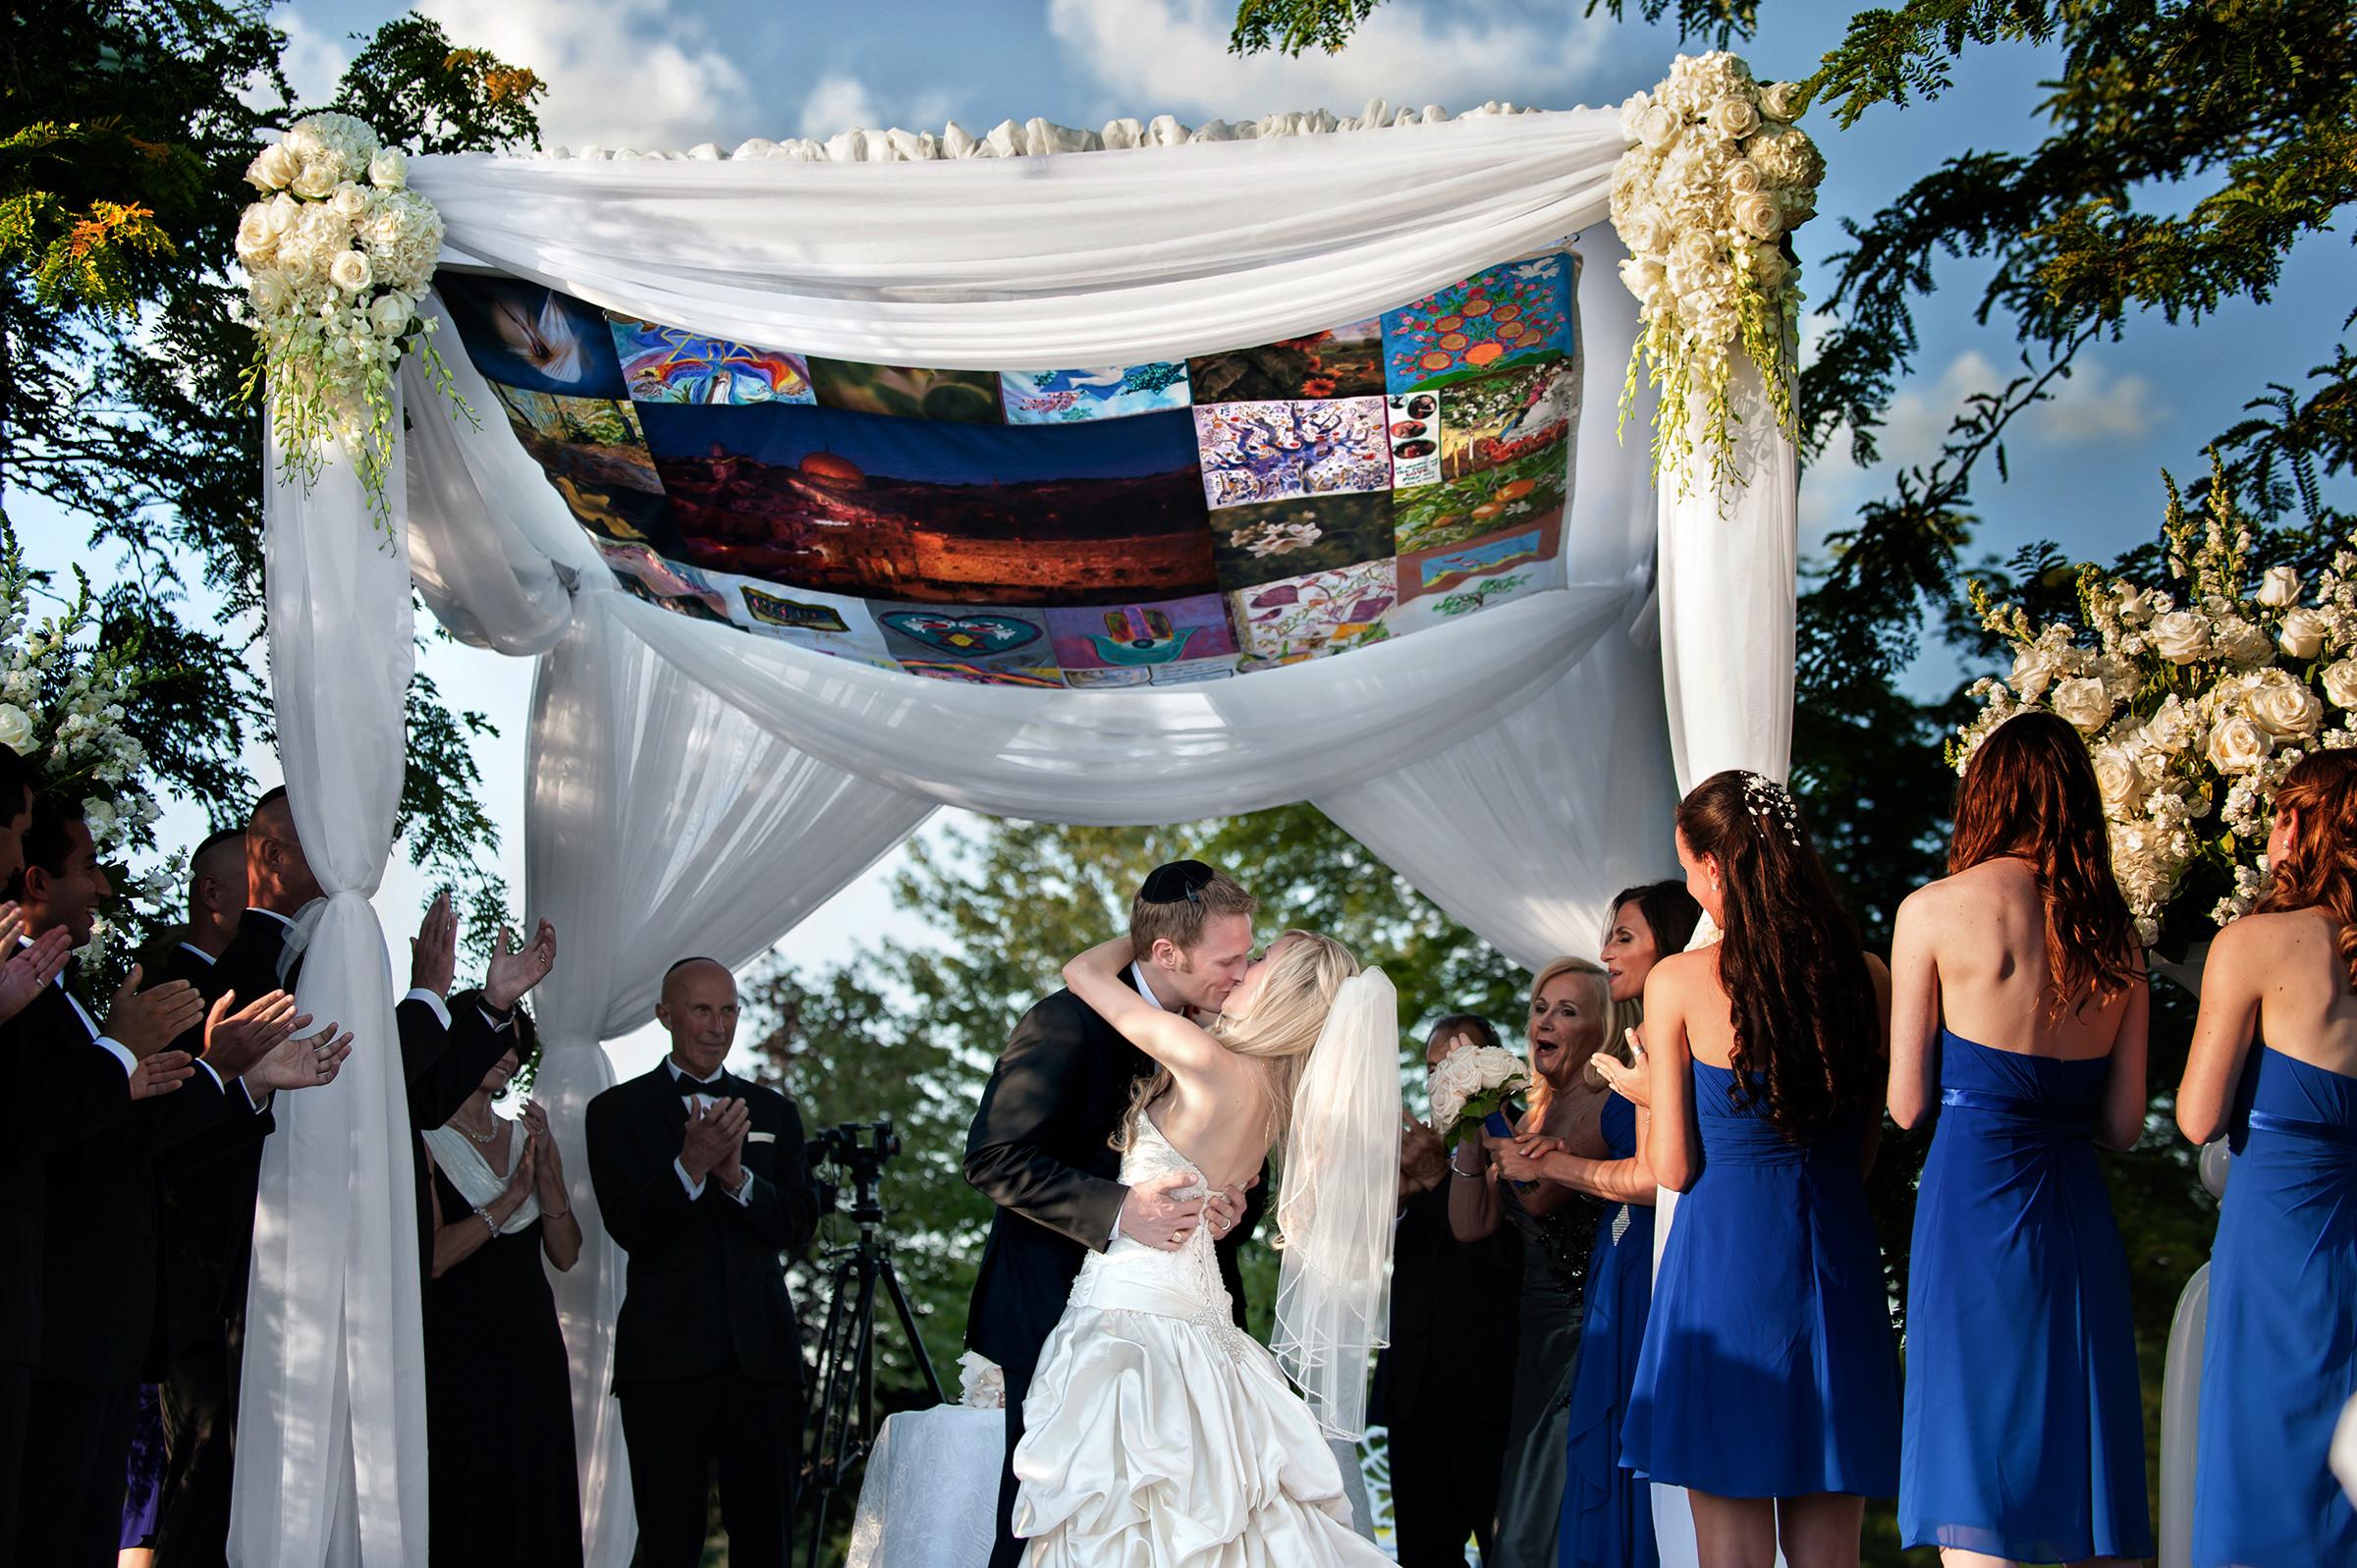 kissing-the-bride-under-chuppah-david-sherry-photography